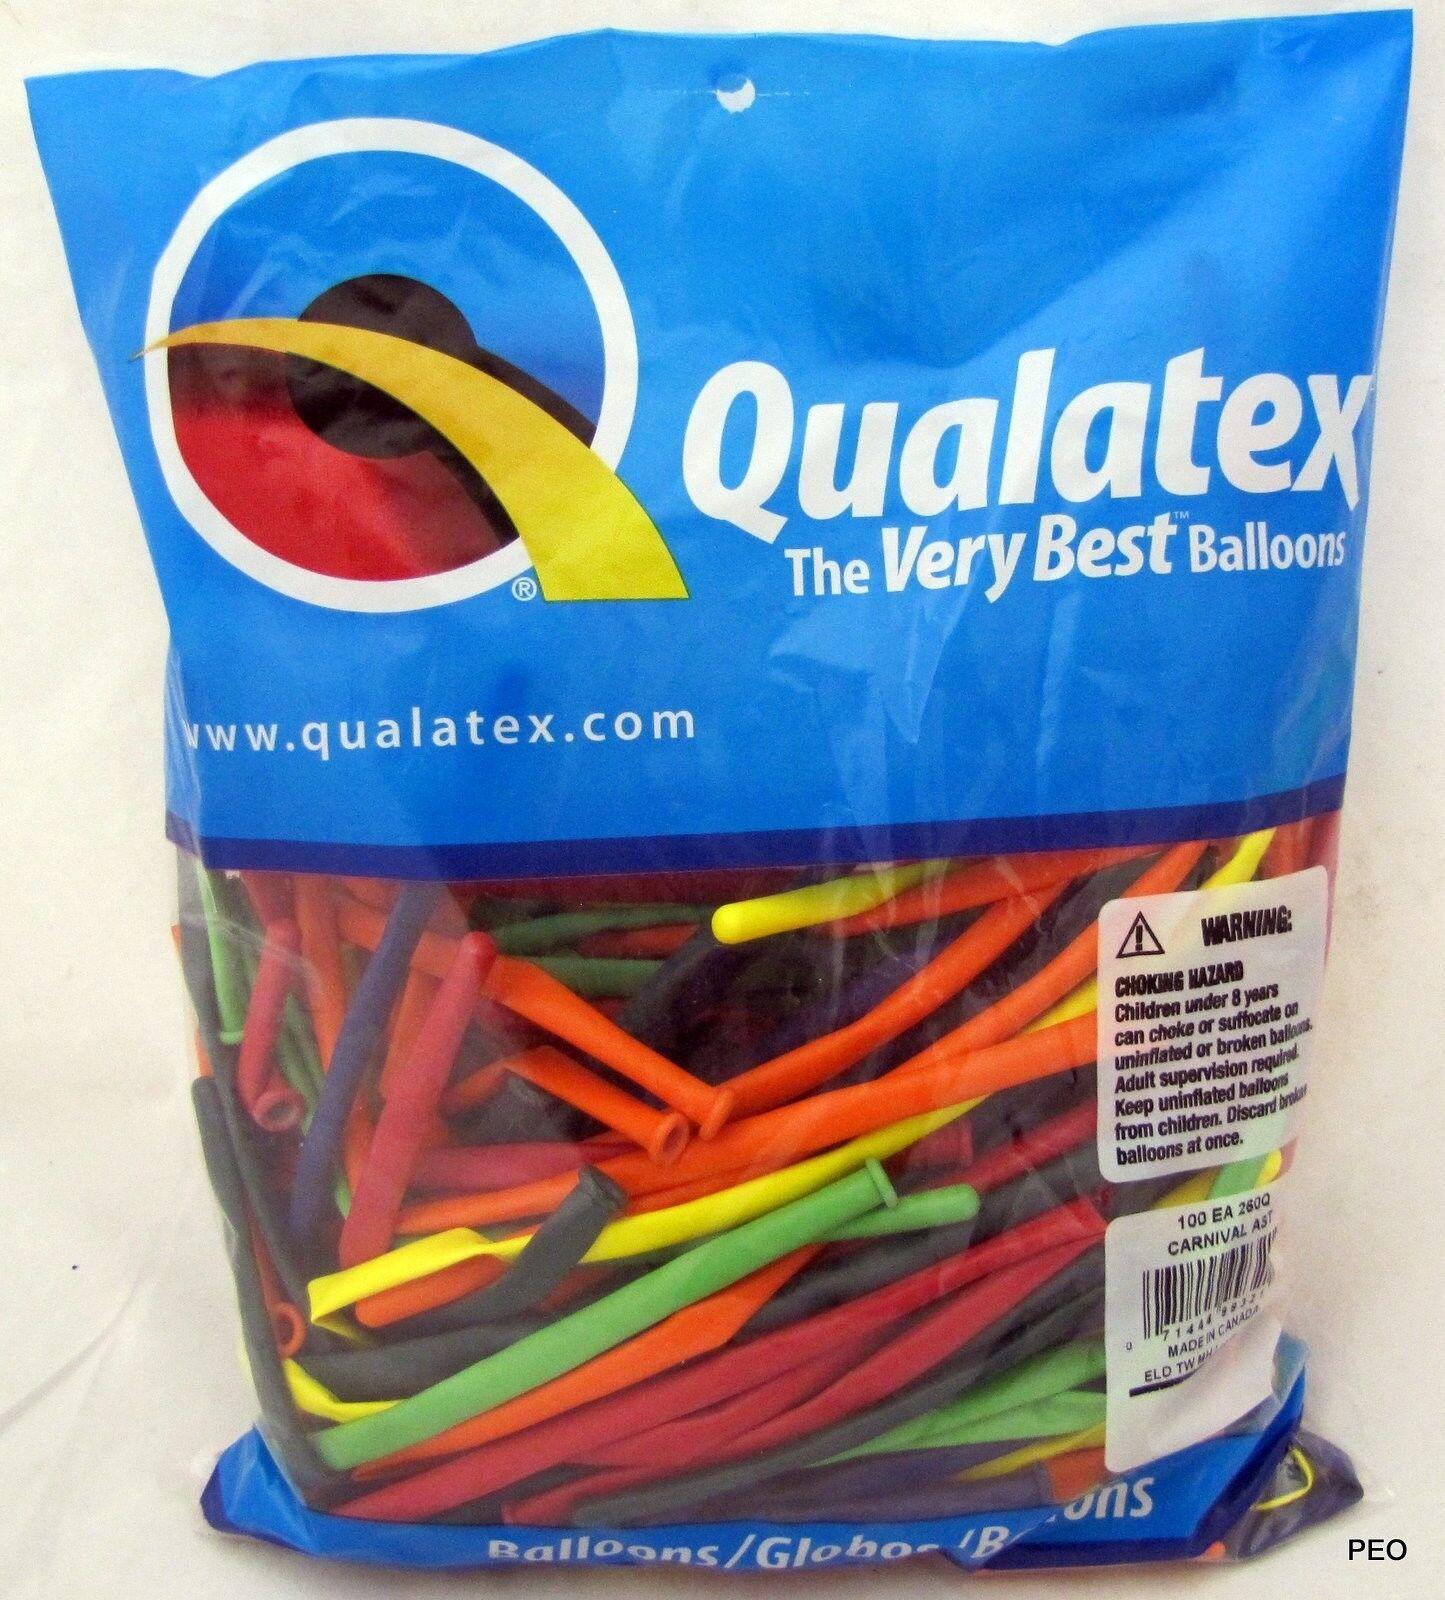 Qualatex Balloons Carnival 100 Ct Random Assortment Animal Twist Sz 260 Balloon